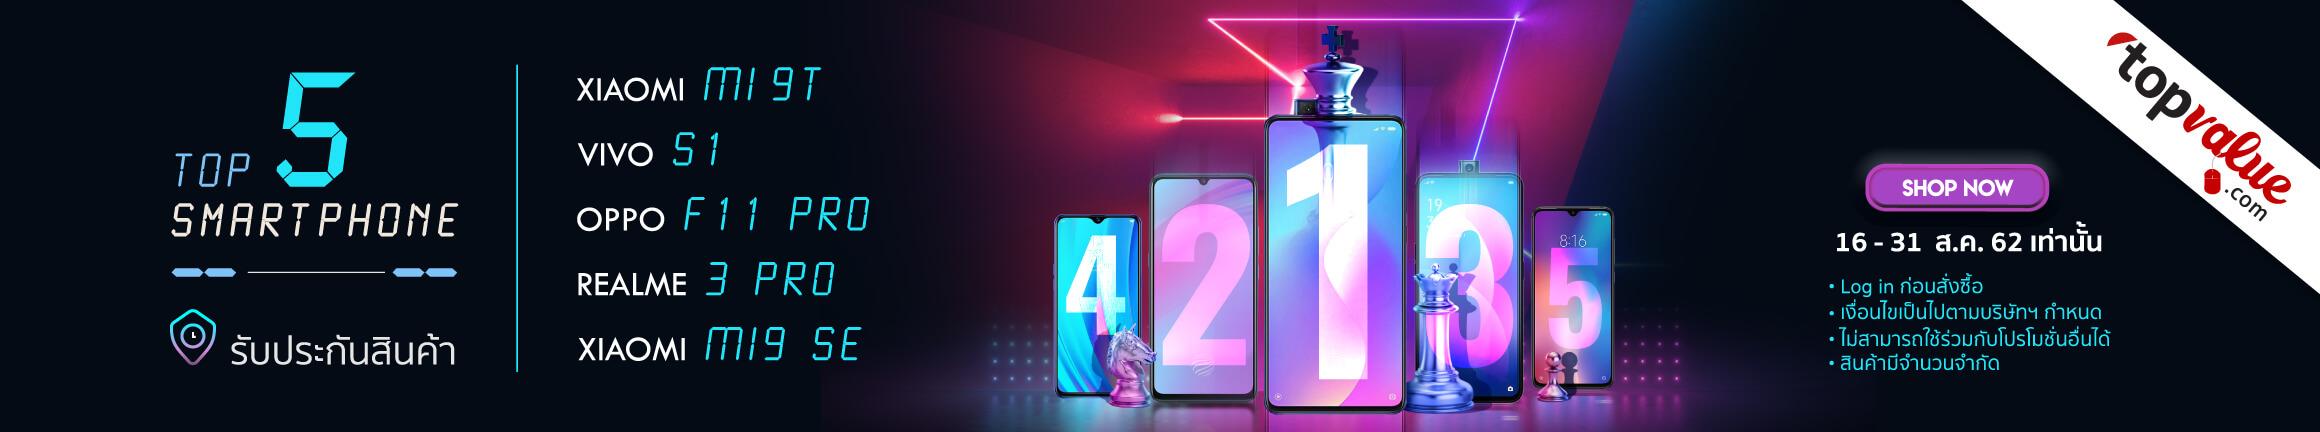 topvalue 5 smartphone